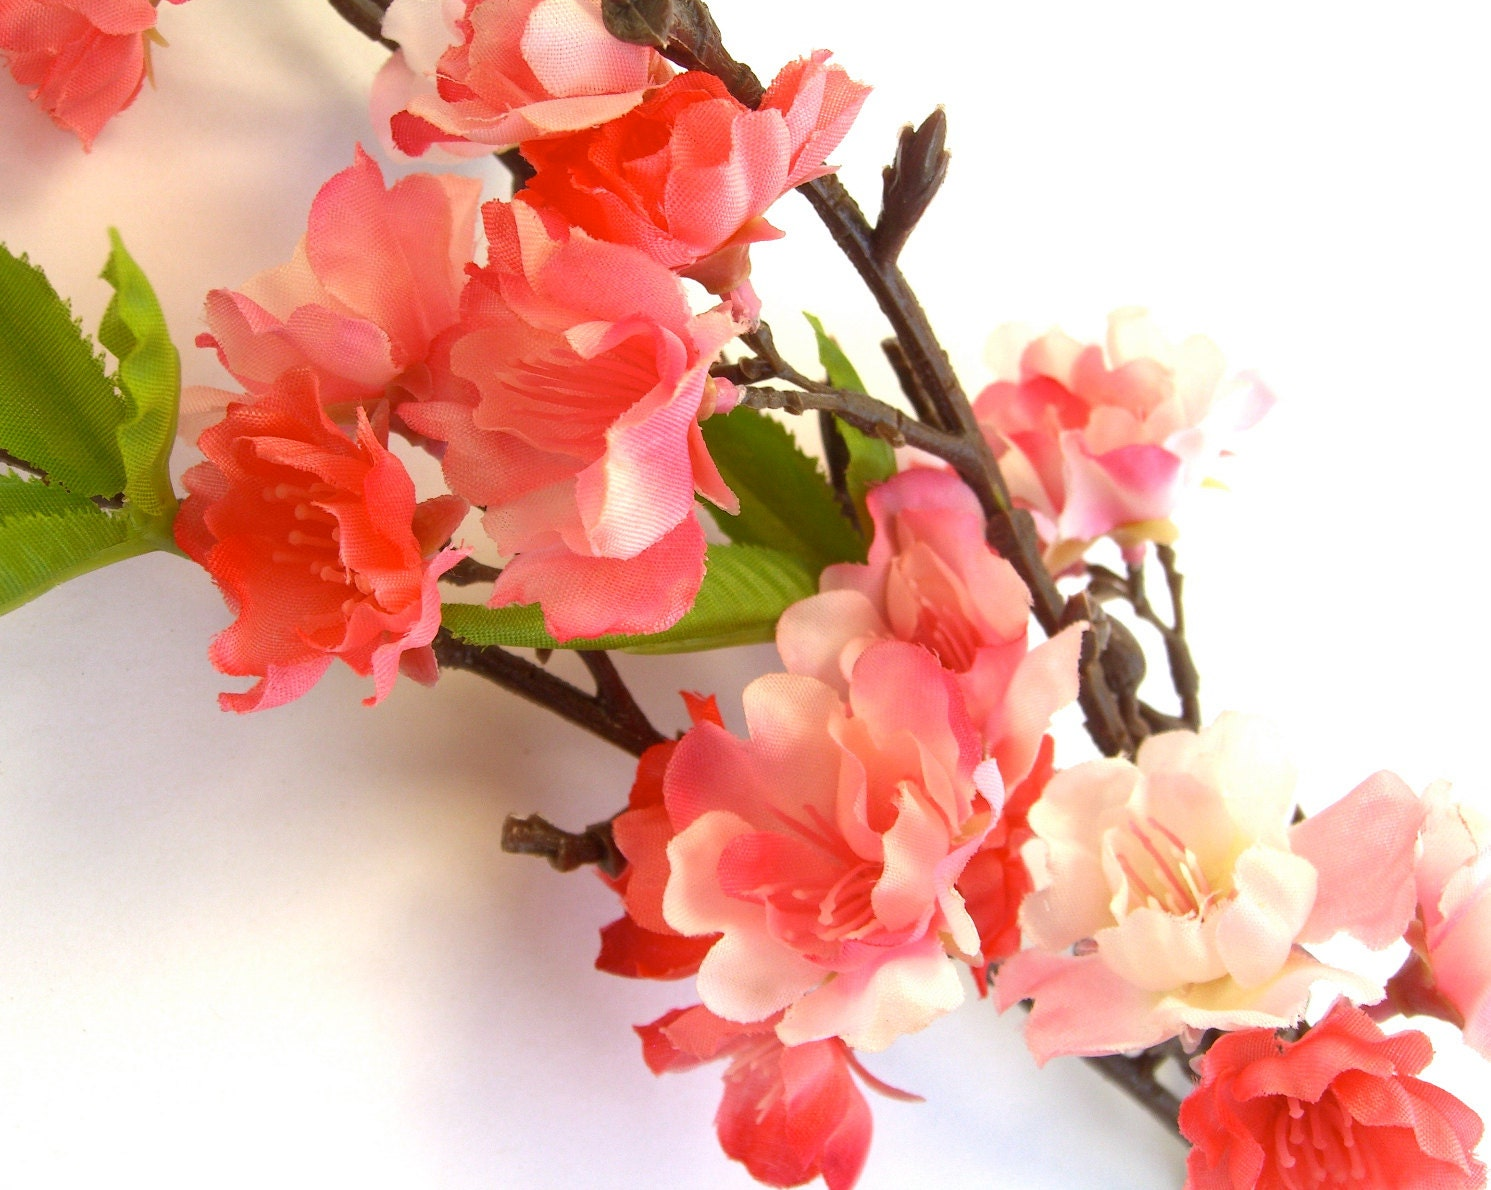 Salmon Cherry Blossoms Peachy Orange Flowers Floral